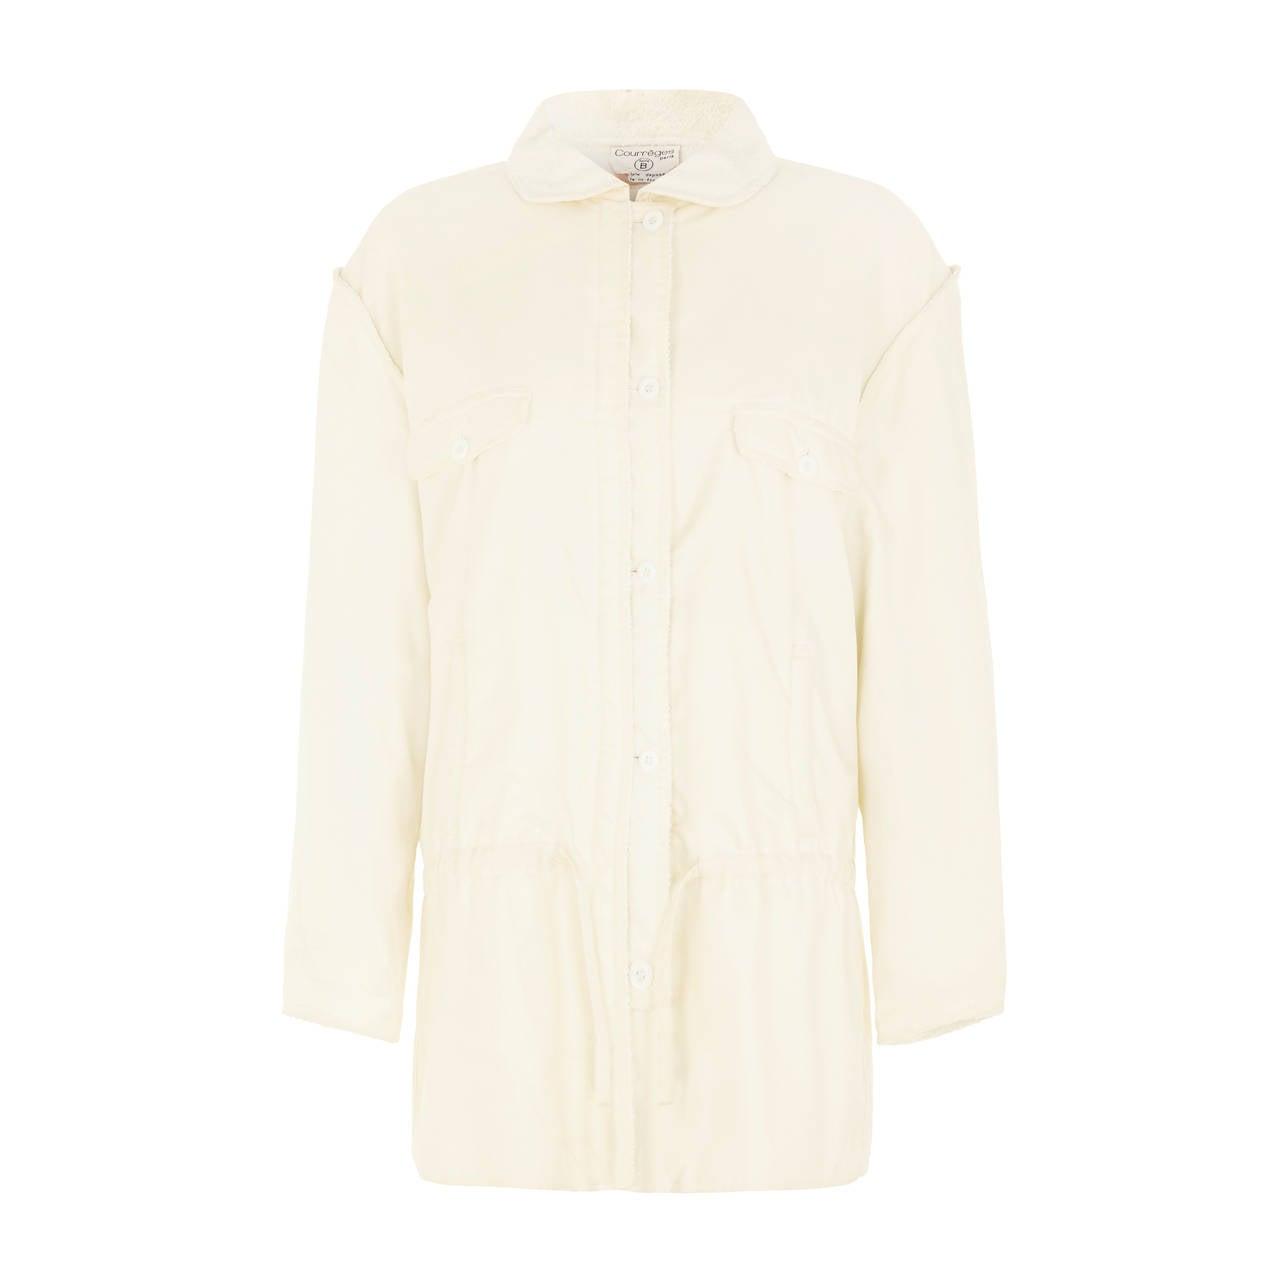 1970s Courreges White Sports Jacket